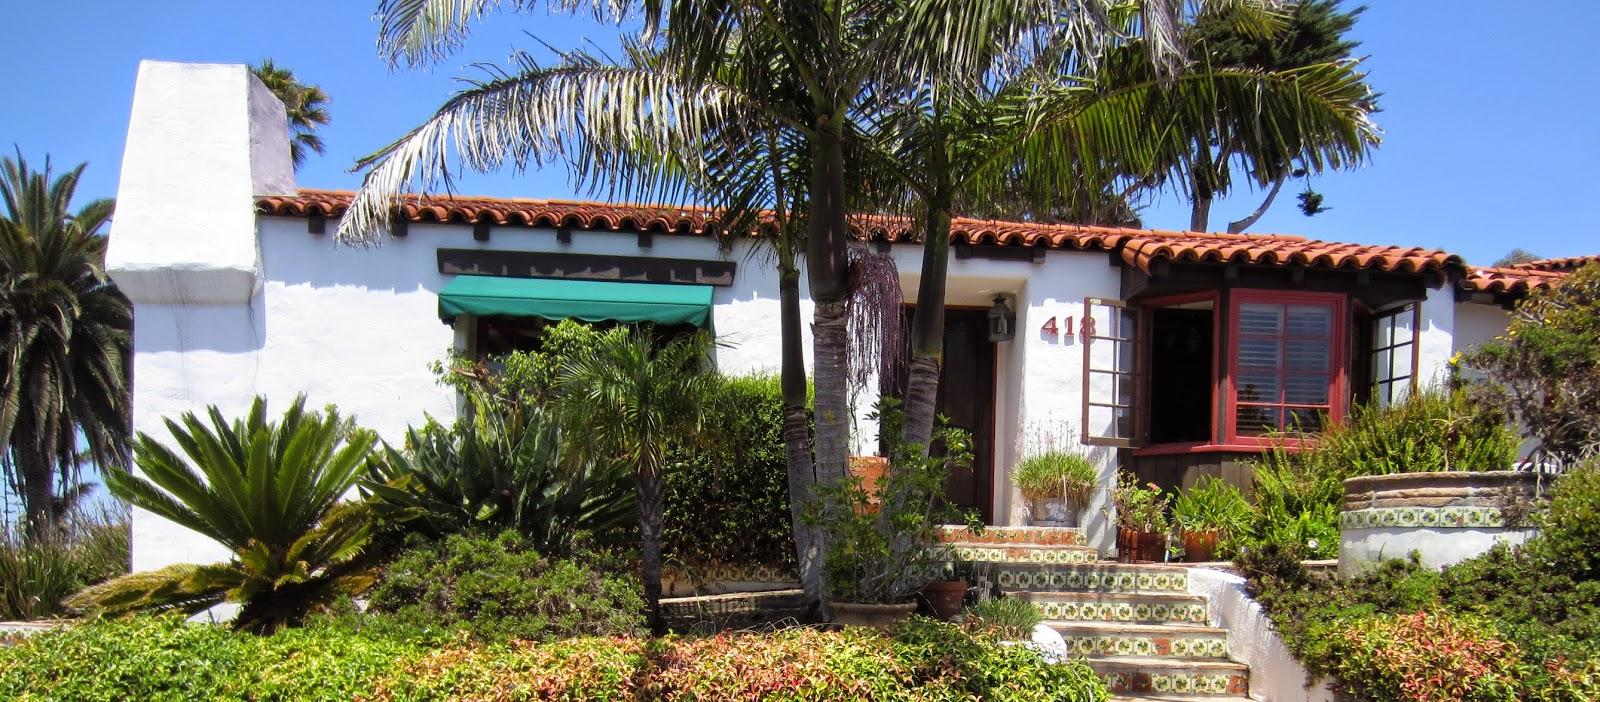 Ole hanson style homes